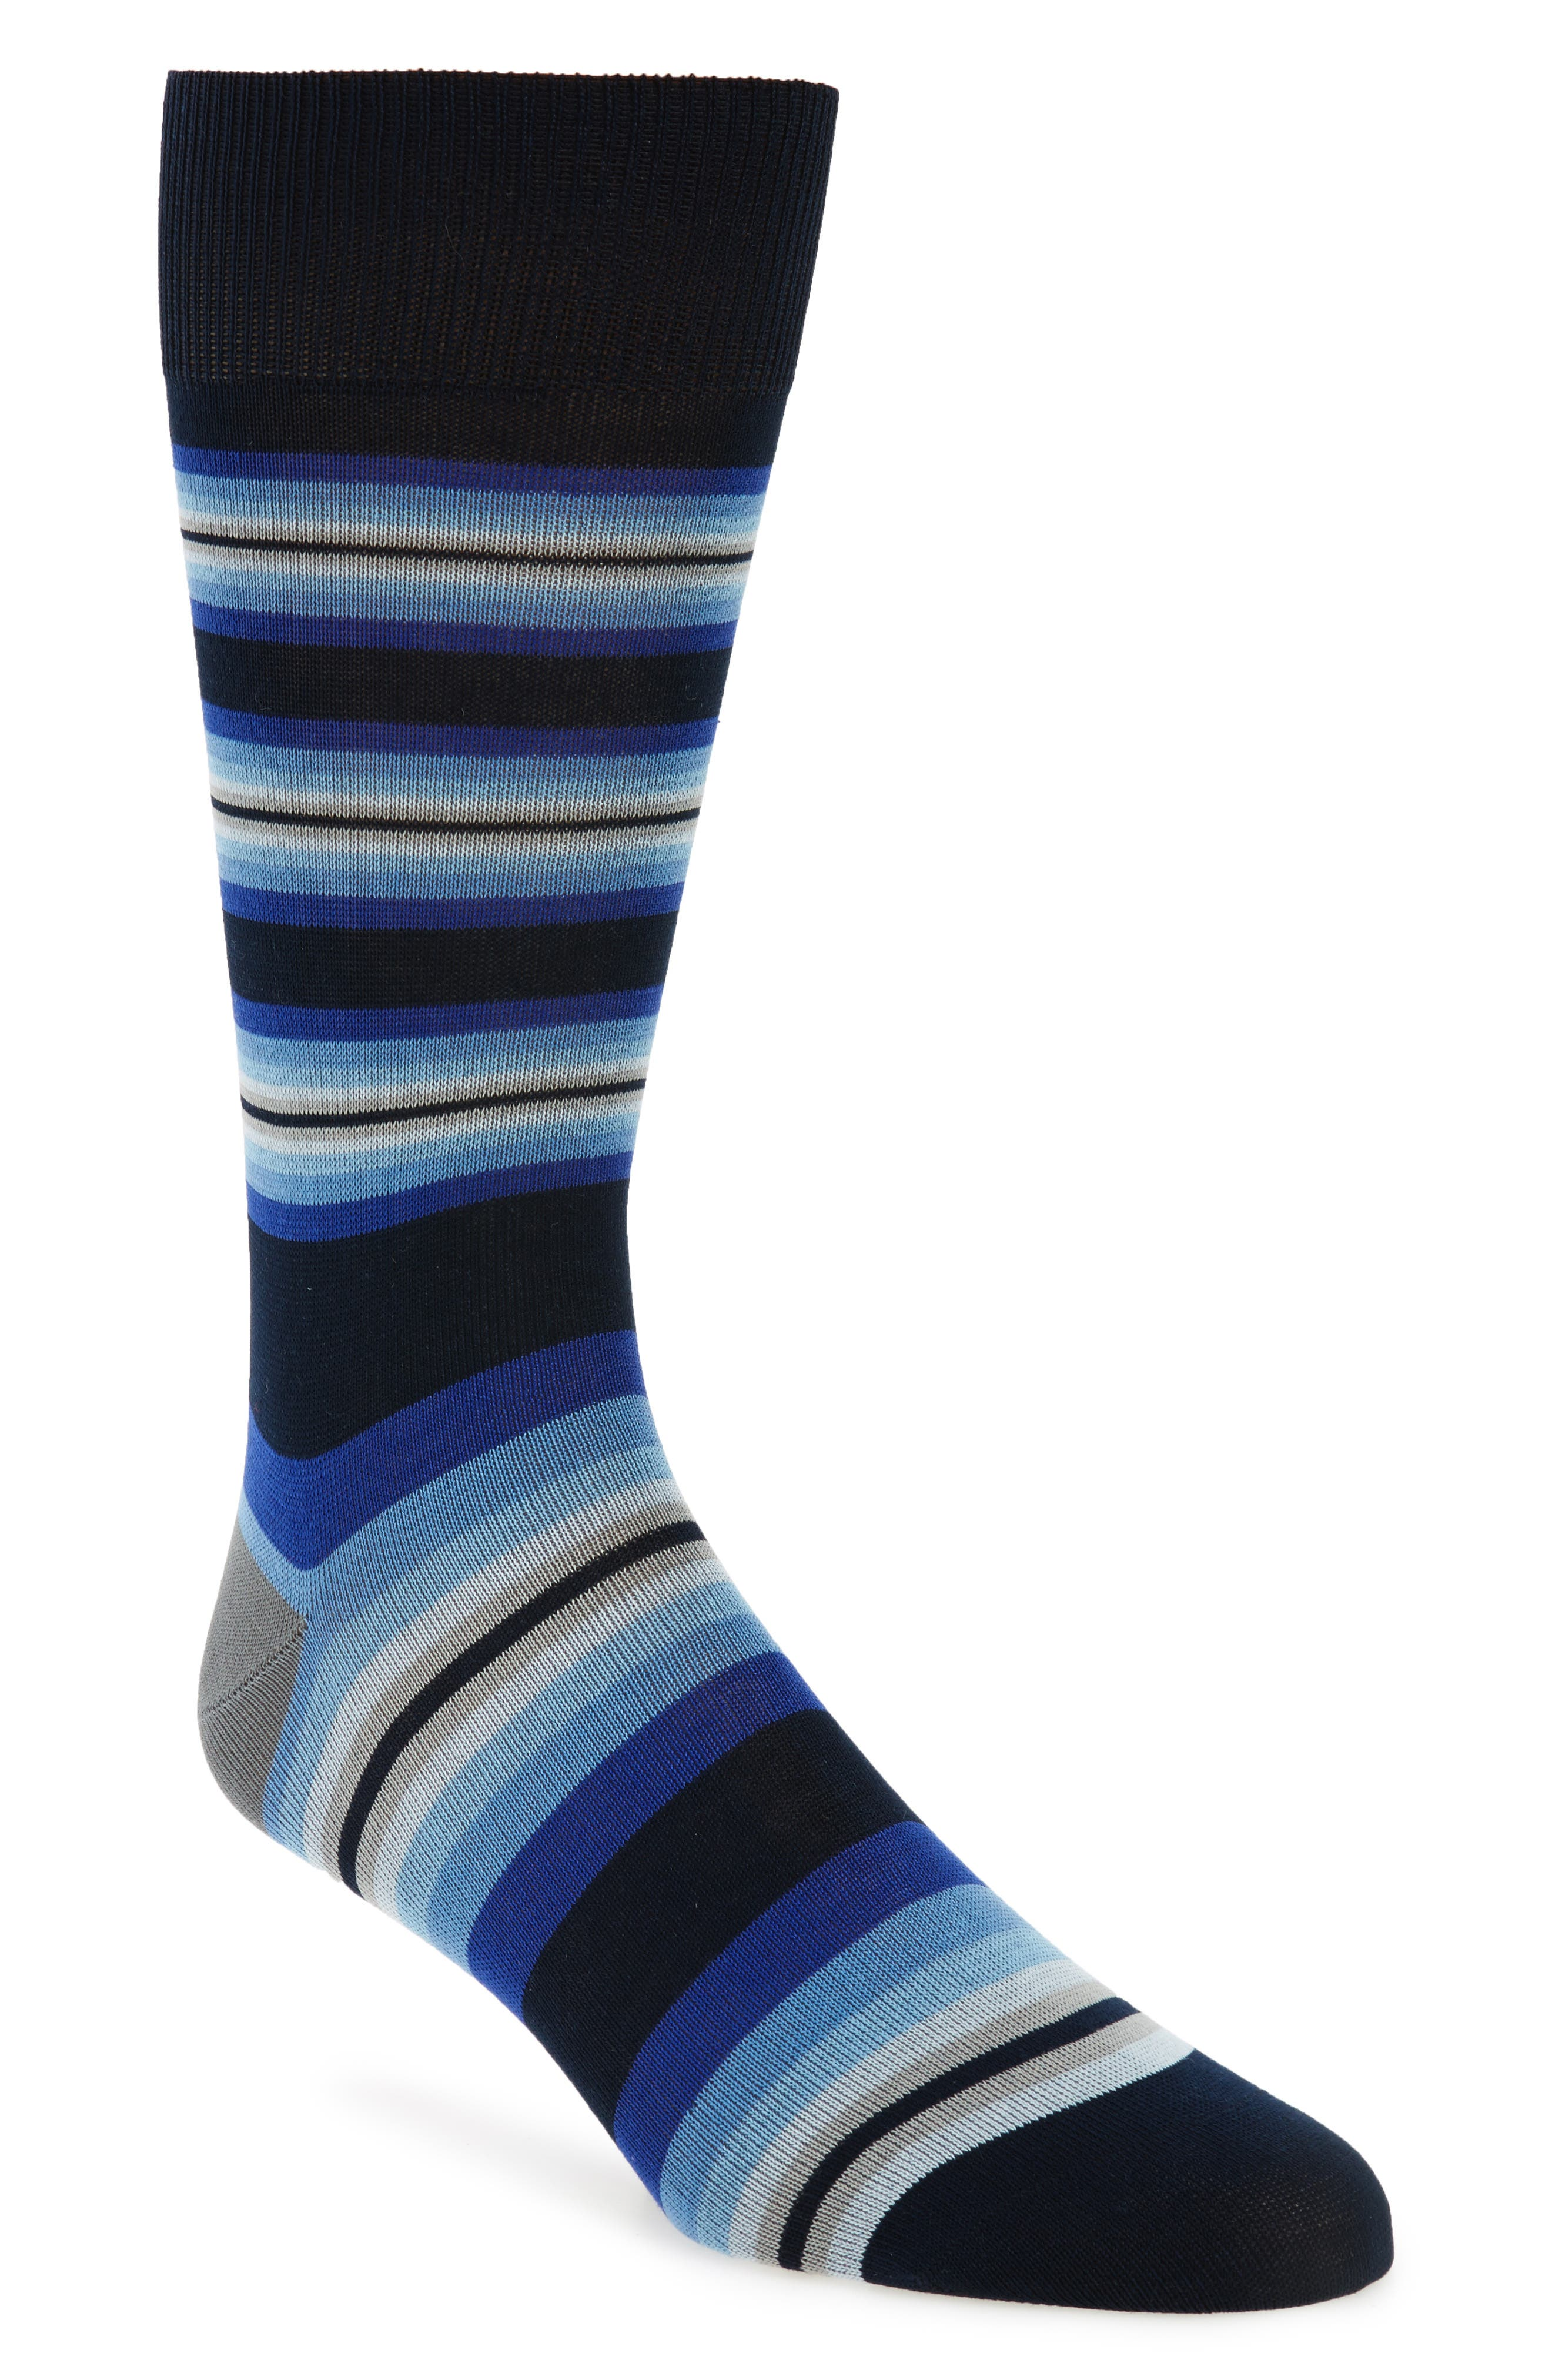 Tiger Stripe Socks,                             Main thumbnail 1, color,                             Blue/ Dark Blue